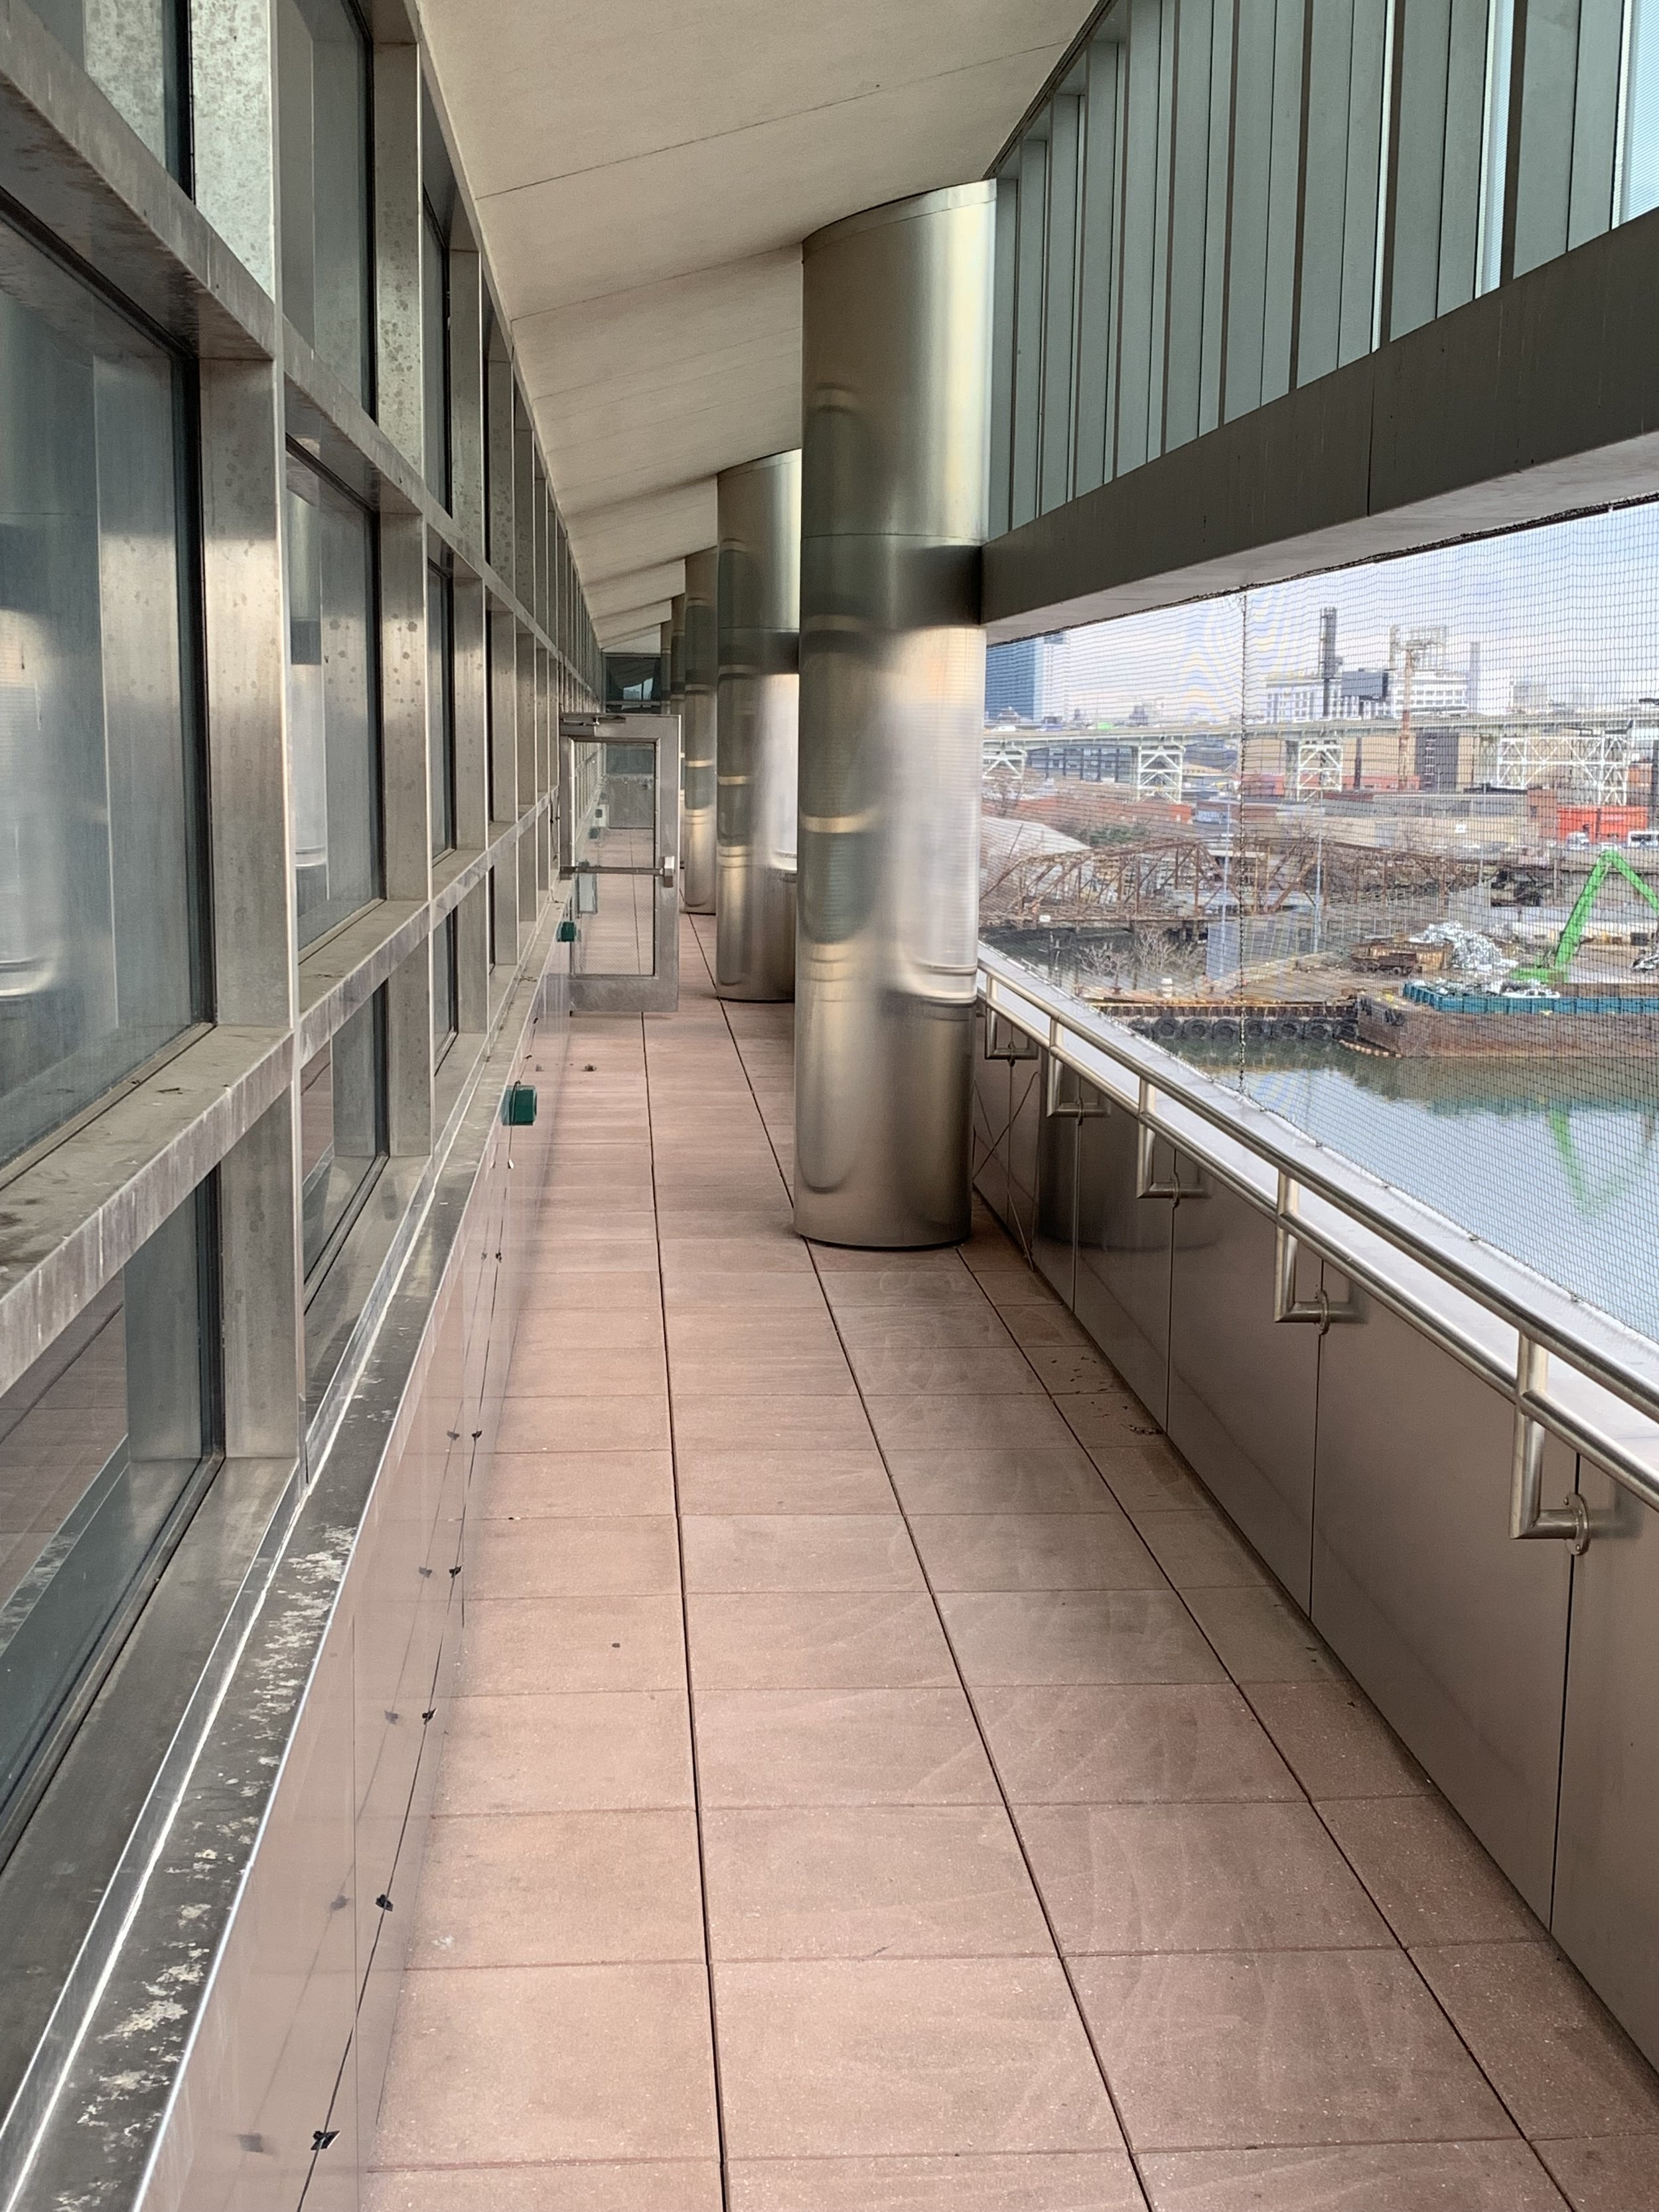 Balcony Enclosed With Bird Netting